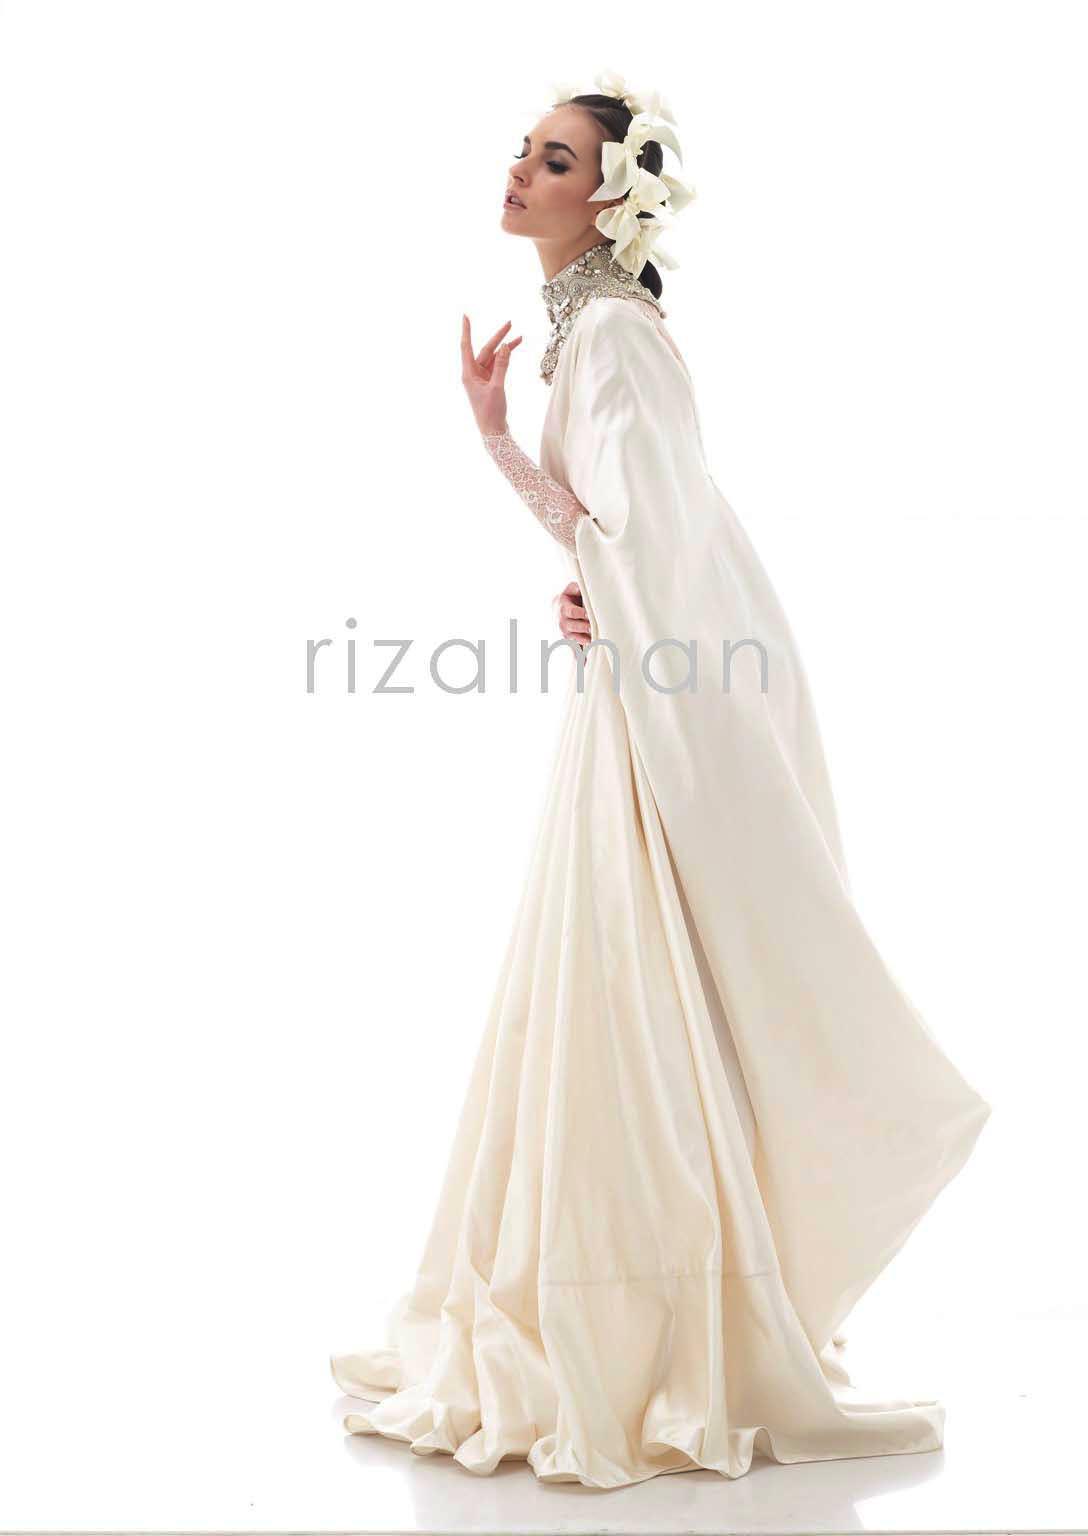 Kanda Dinda with Love: More Rizalman Bridal 2011